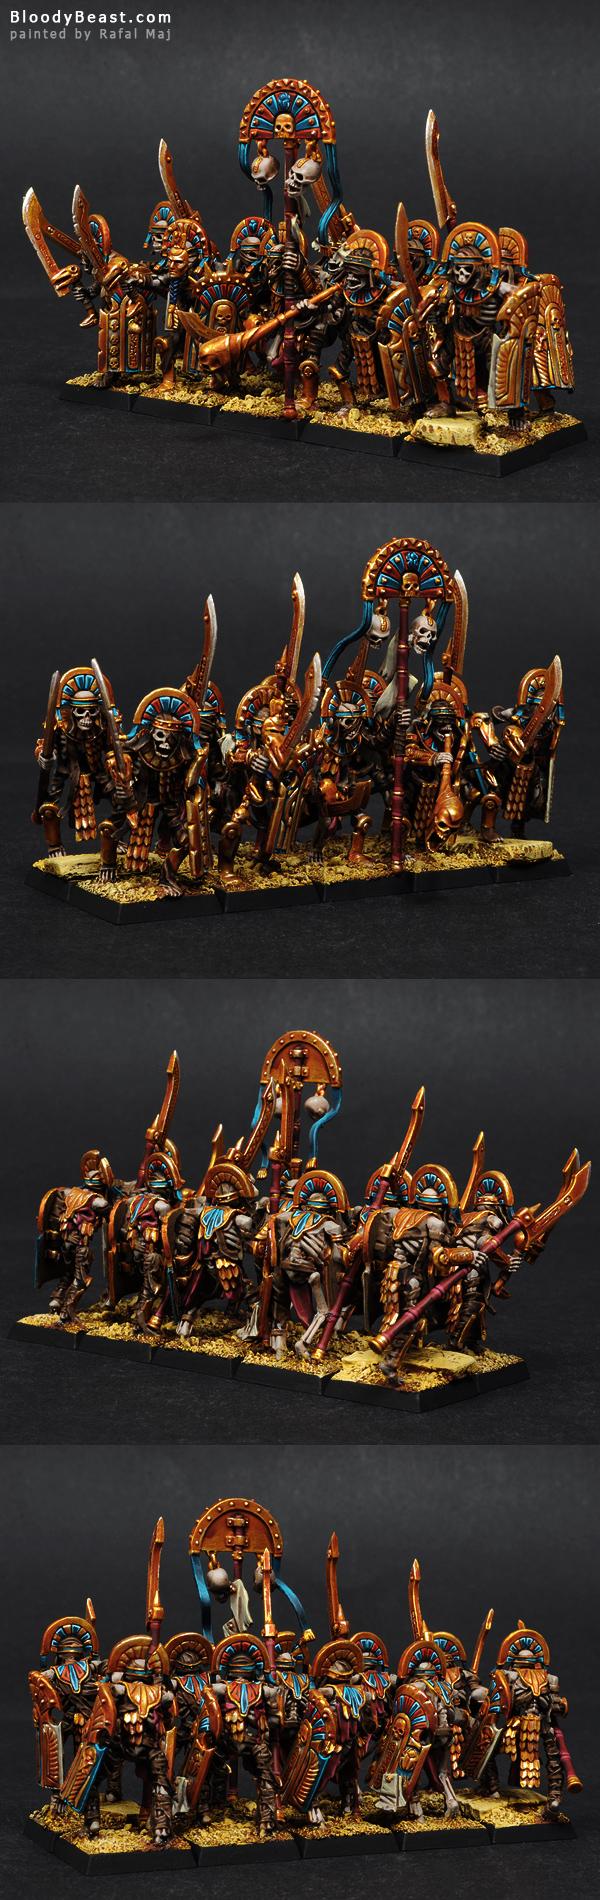 Tomb Kings Tomb Guards painted by Rafal Maj (BloodyBeast.com)